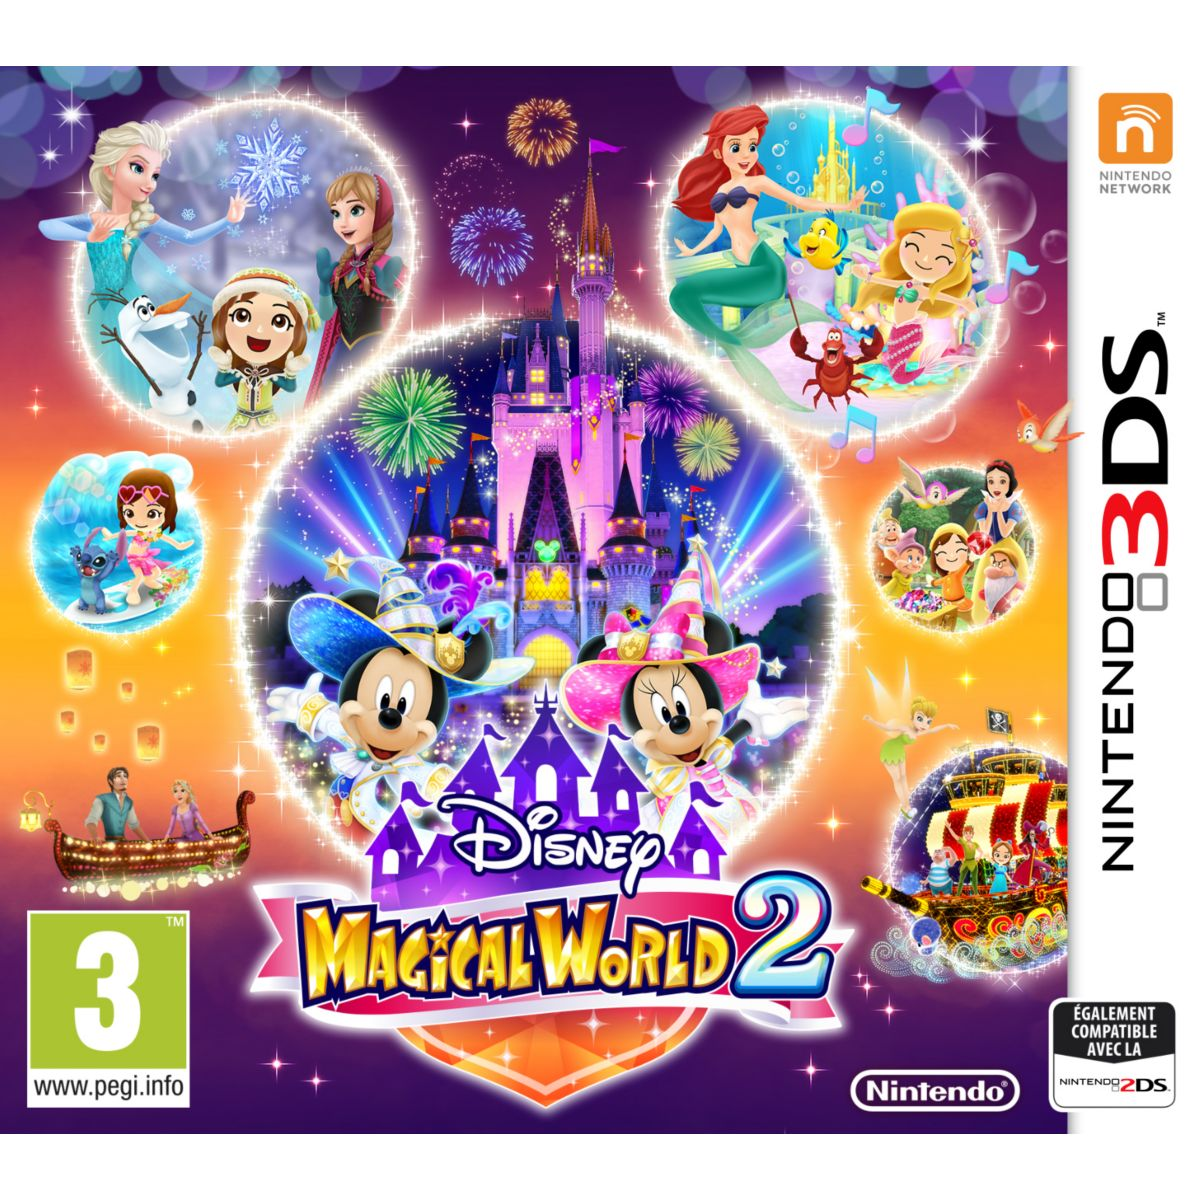 Jeu 3DS NINTENDO Disney Magical World 2 (photo)